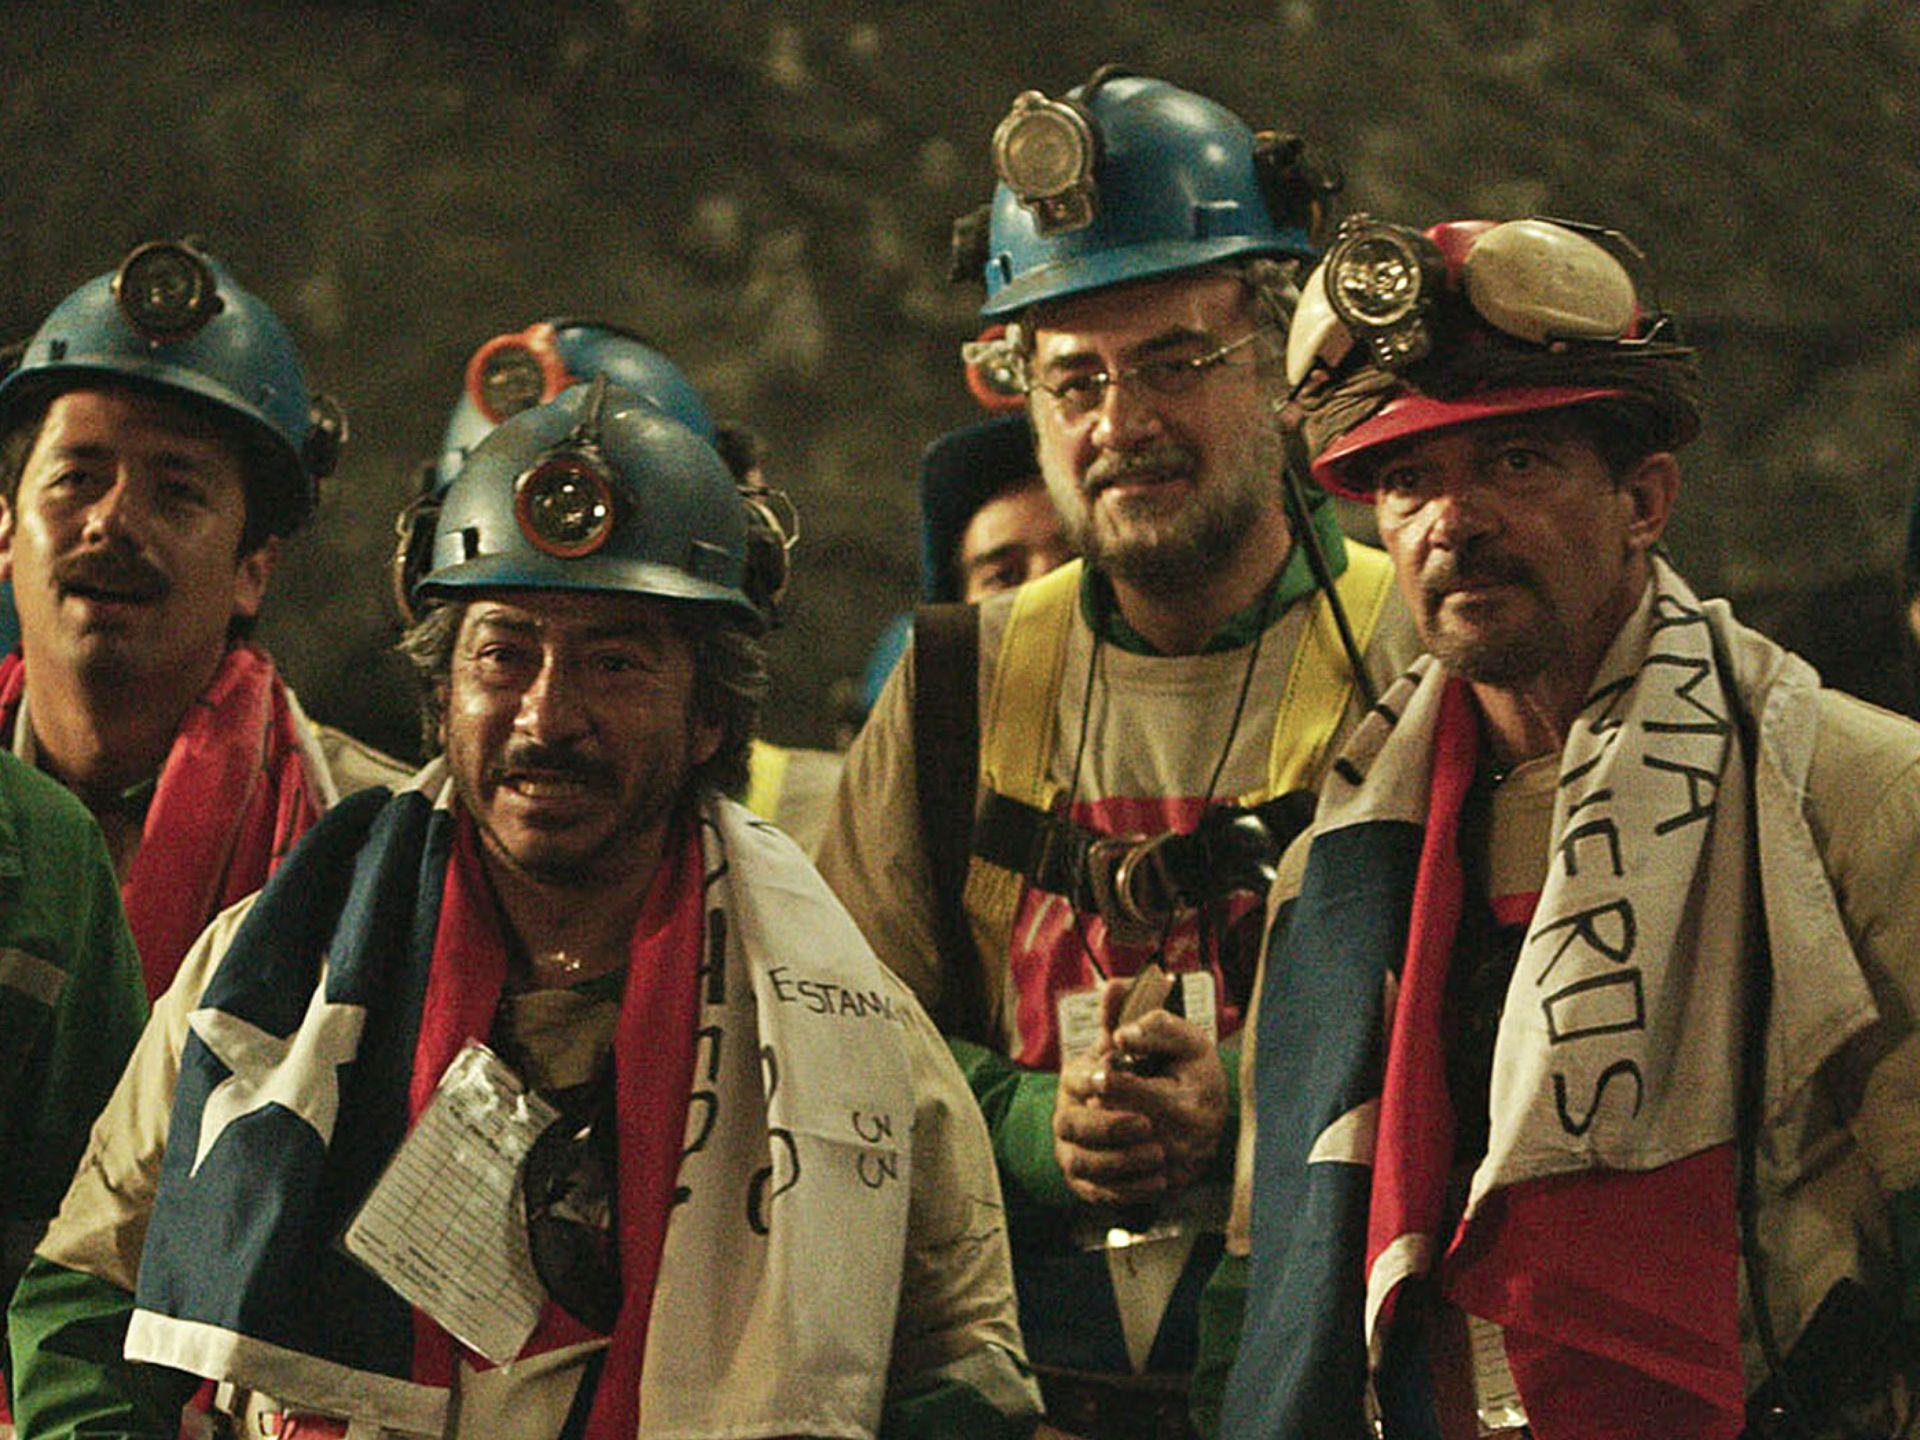 Los 33: Antonio Banderas e i colleghi con addosso la bandiera del Cile